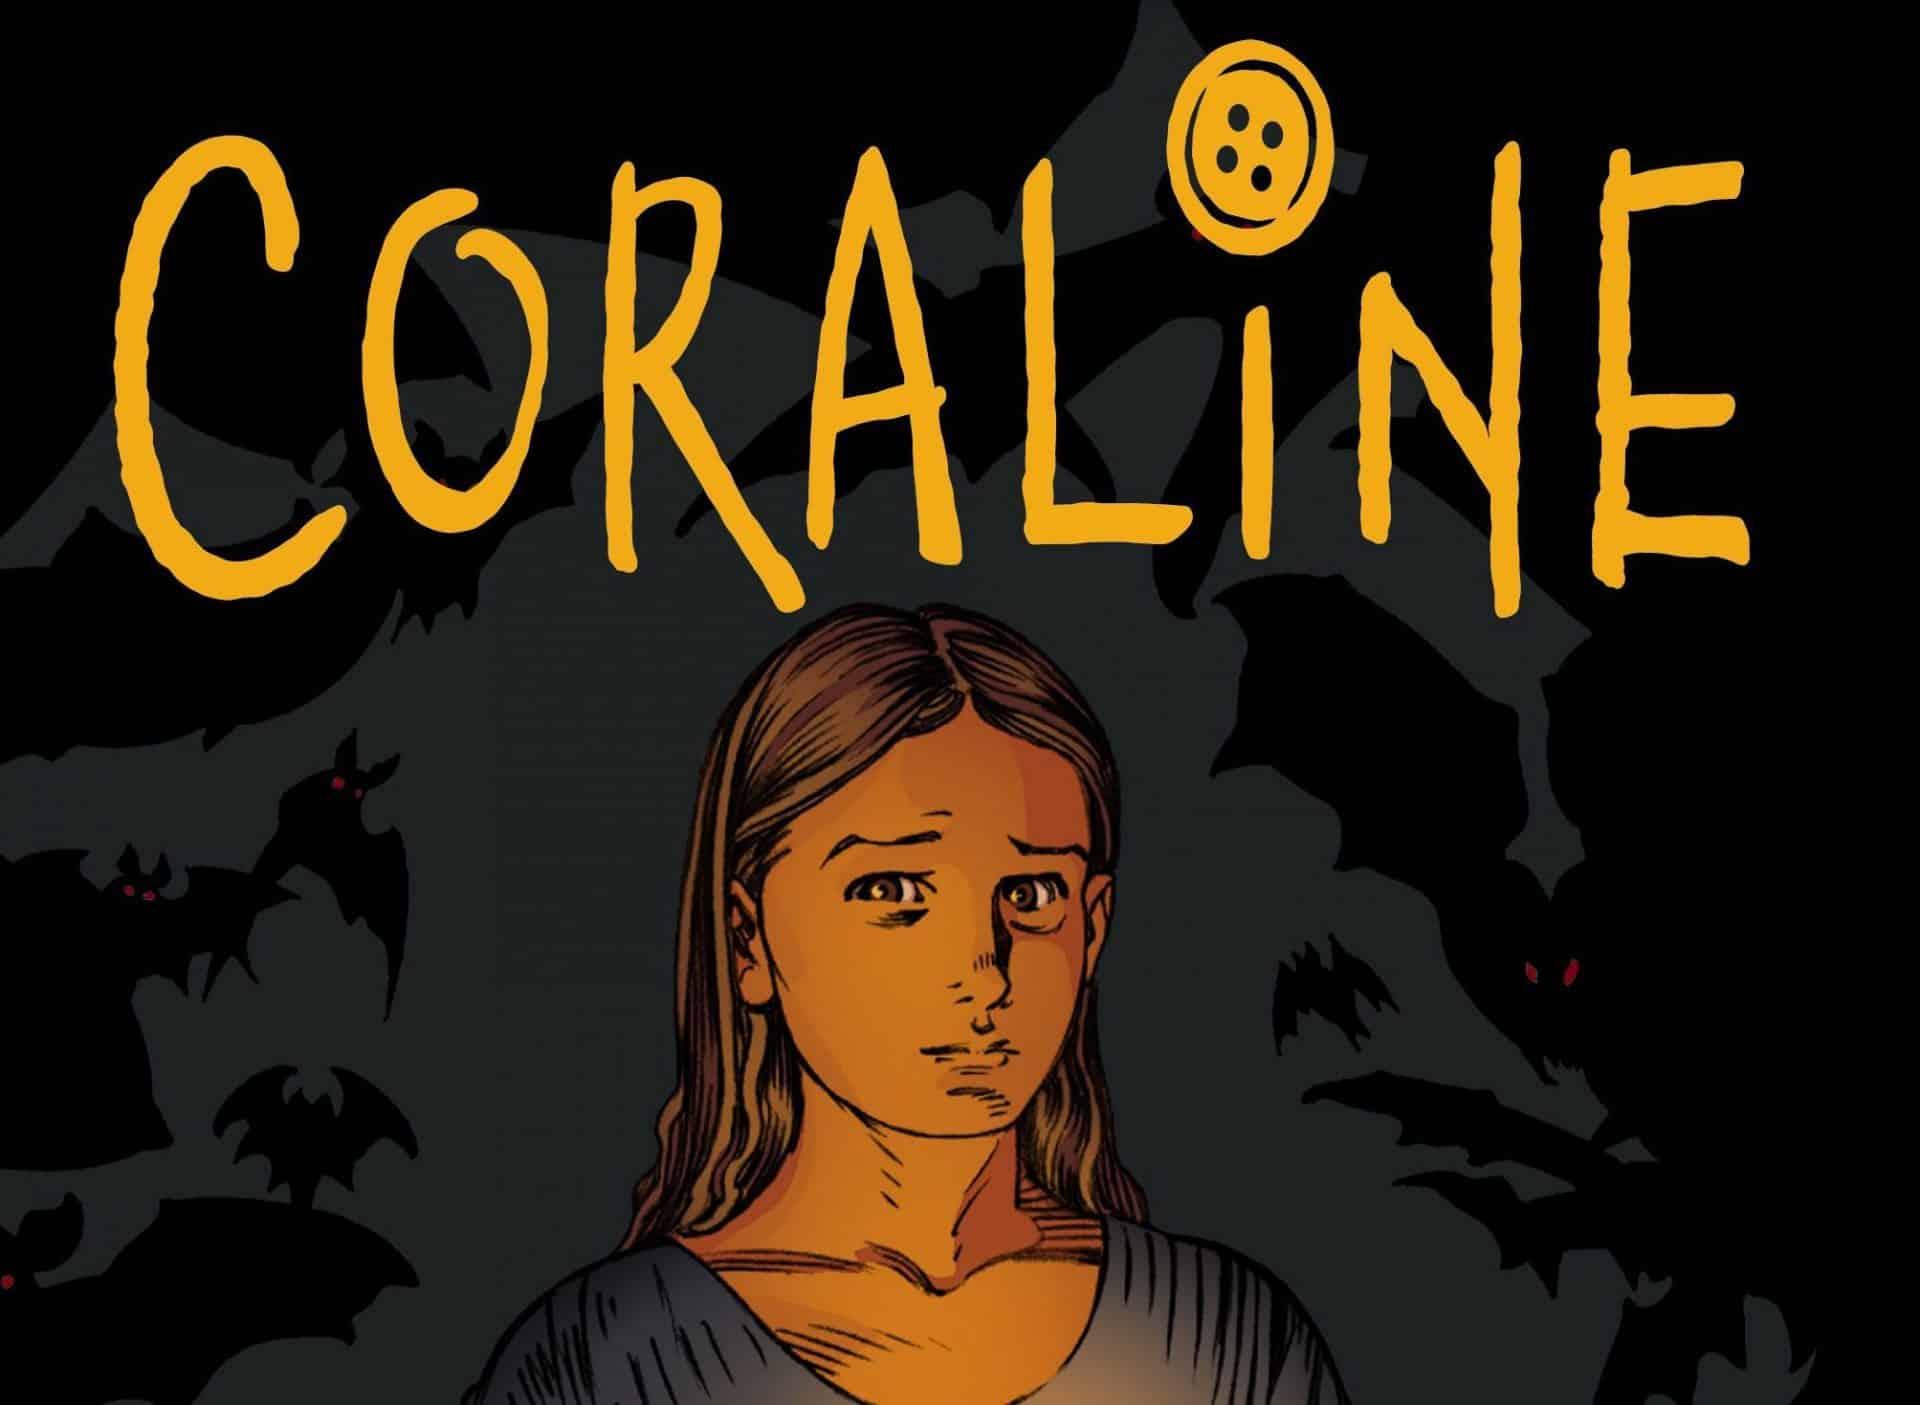 Coraline Audiobook Streaming Online